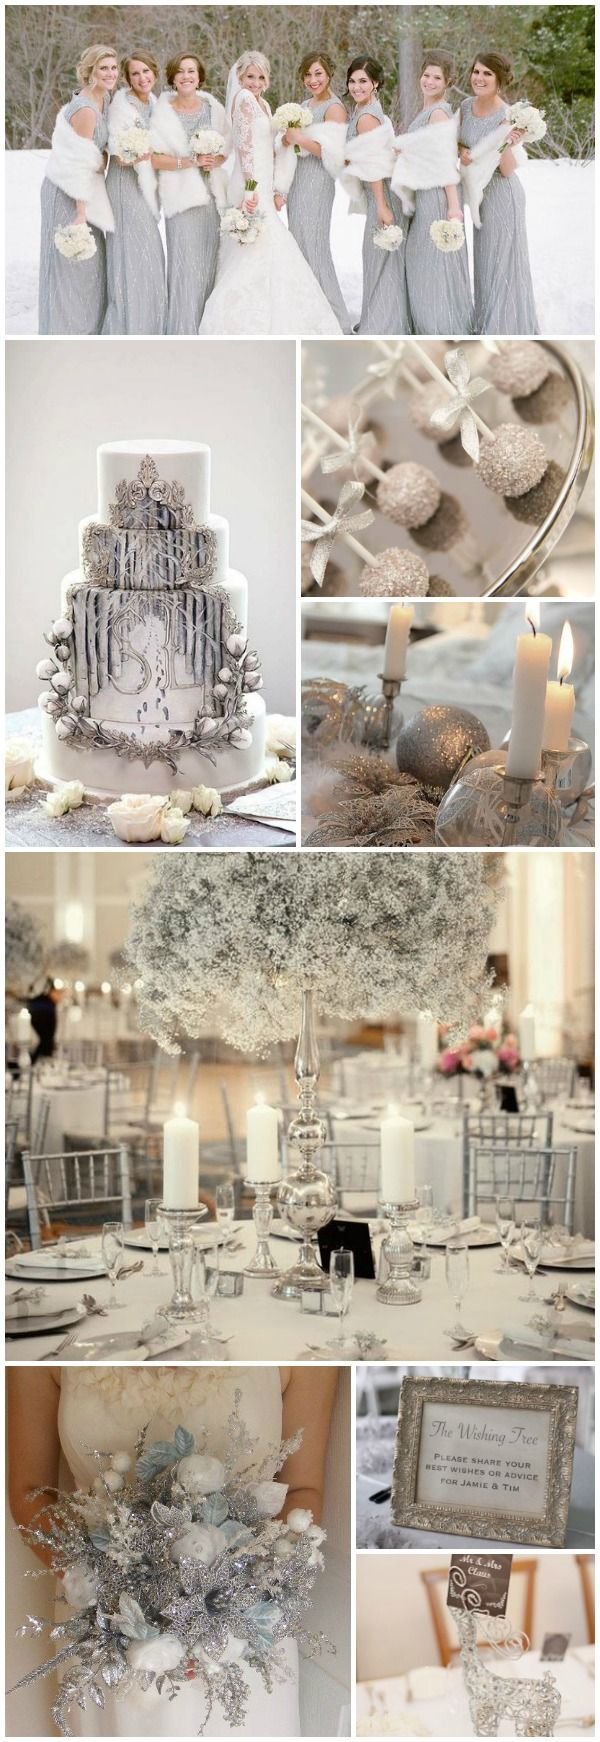 White wedding decoration ideas  Top  Incredible Winter Wonderland Wedding Decorations Ideas